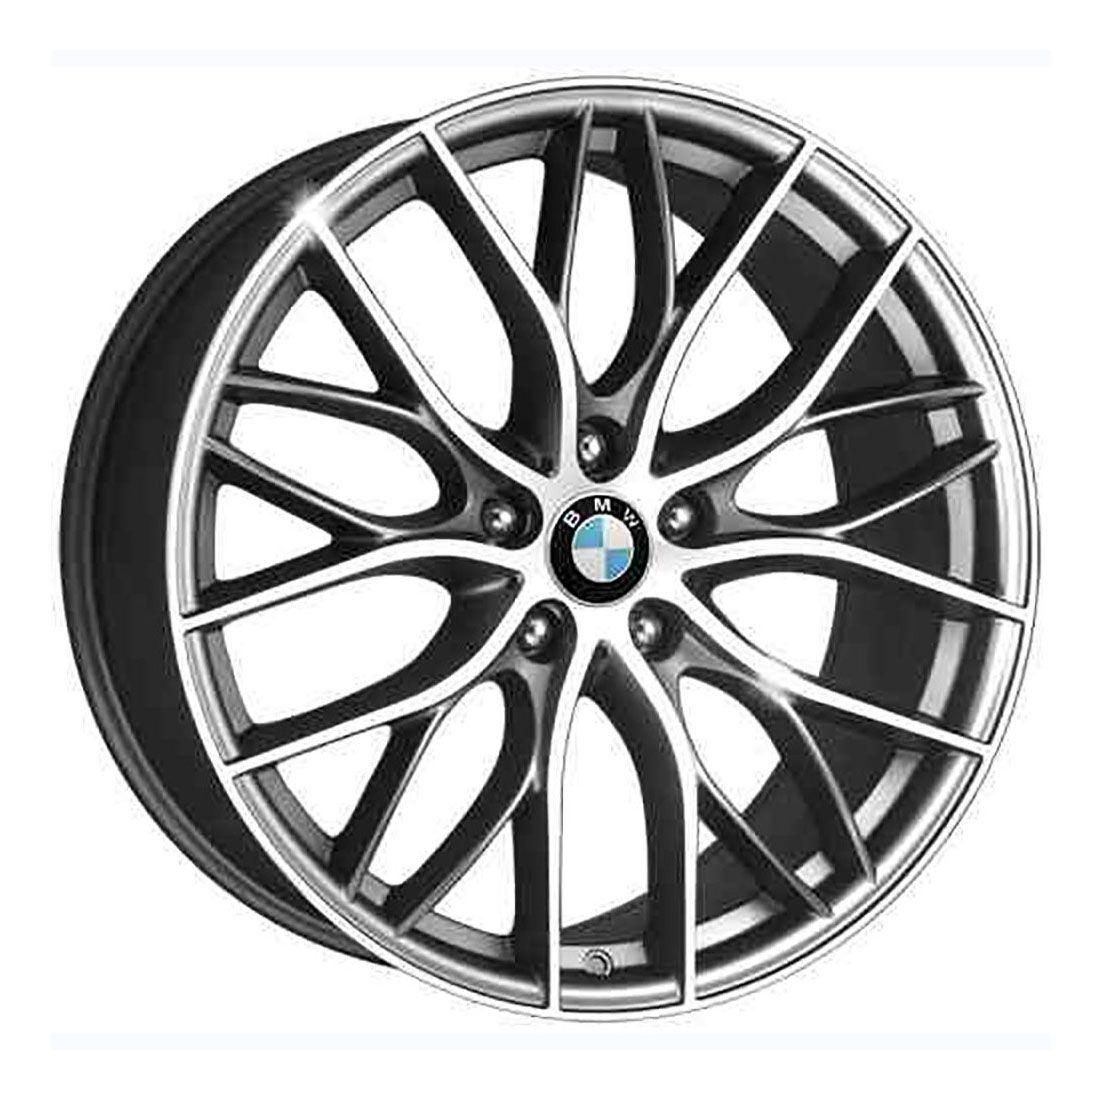 Kit 4 Rodas Aro 17x7 BMW 335i Biturbo 5x114,3 GD  Krmai R54